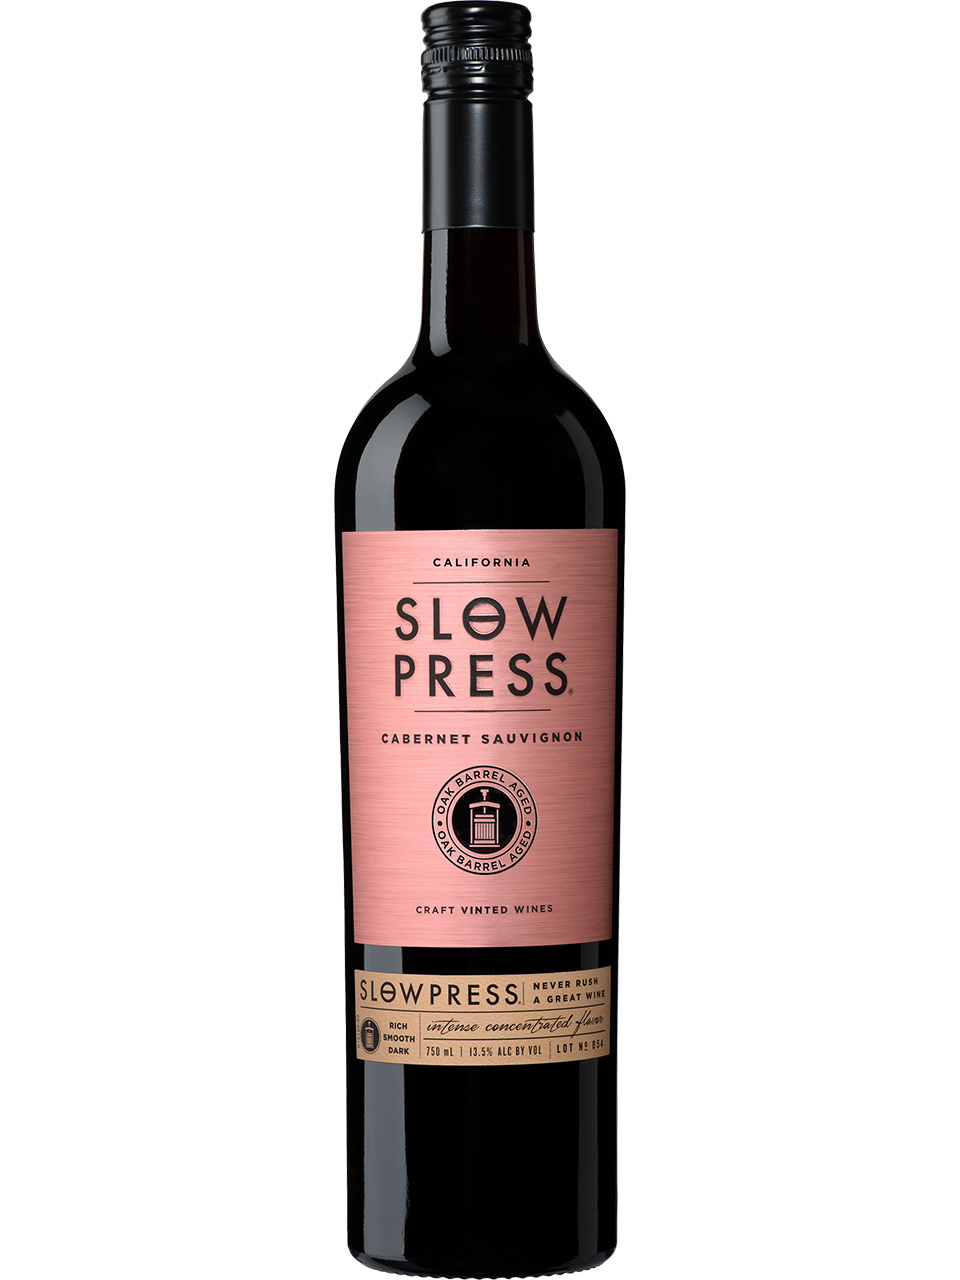 Slow Press Cabernet Sauvignon